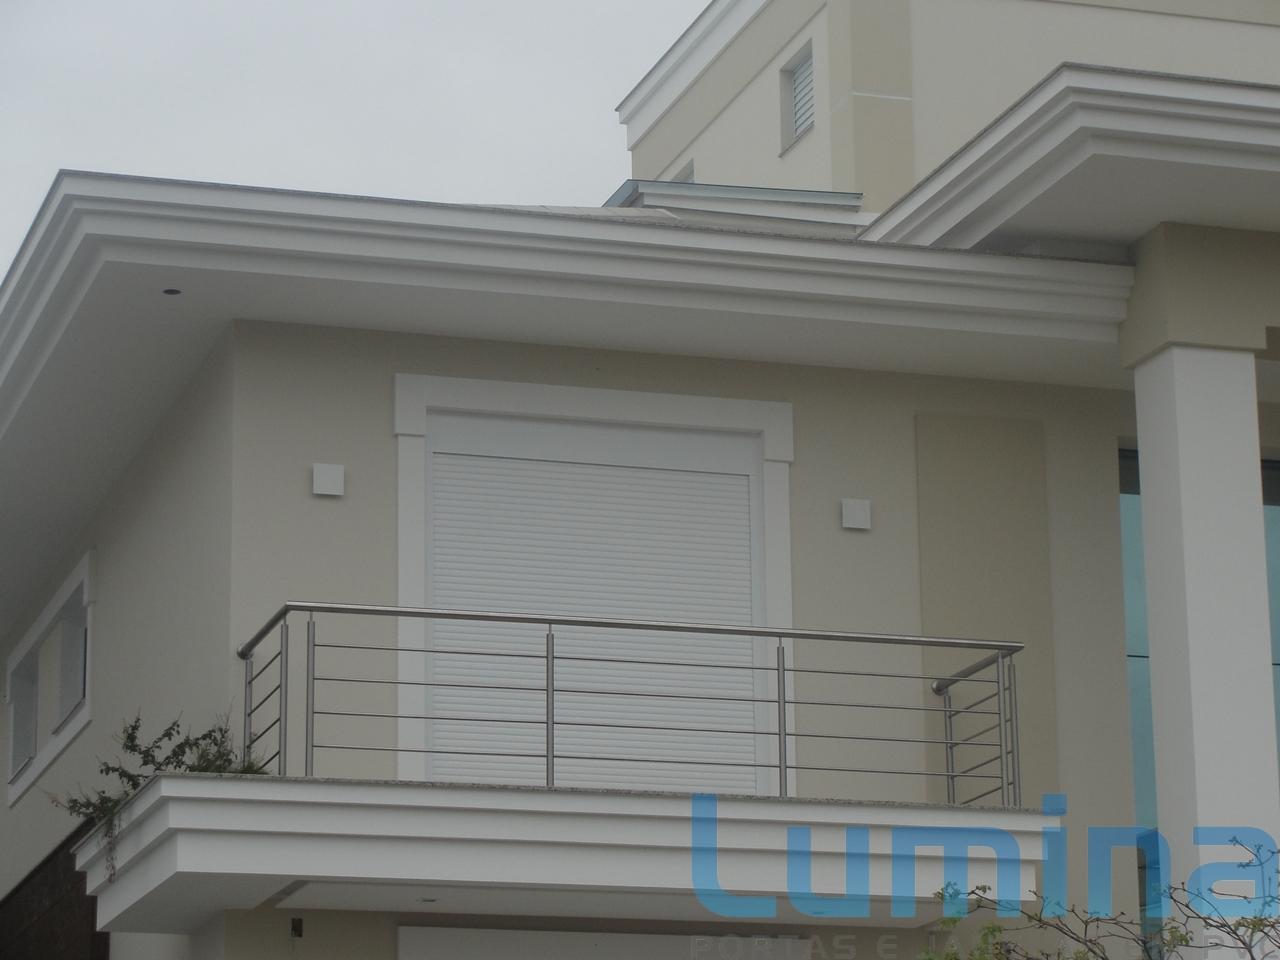 #26516D Janela   Lumina portas   esquadrias PVC %284%29.JPG 1030 Portas E Janelas De Aluminio Campo Grande Ms